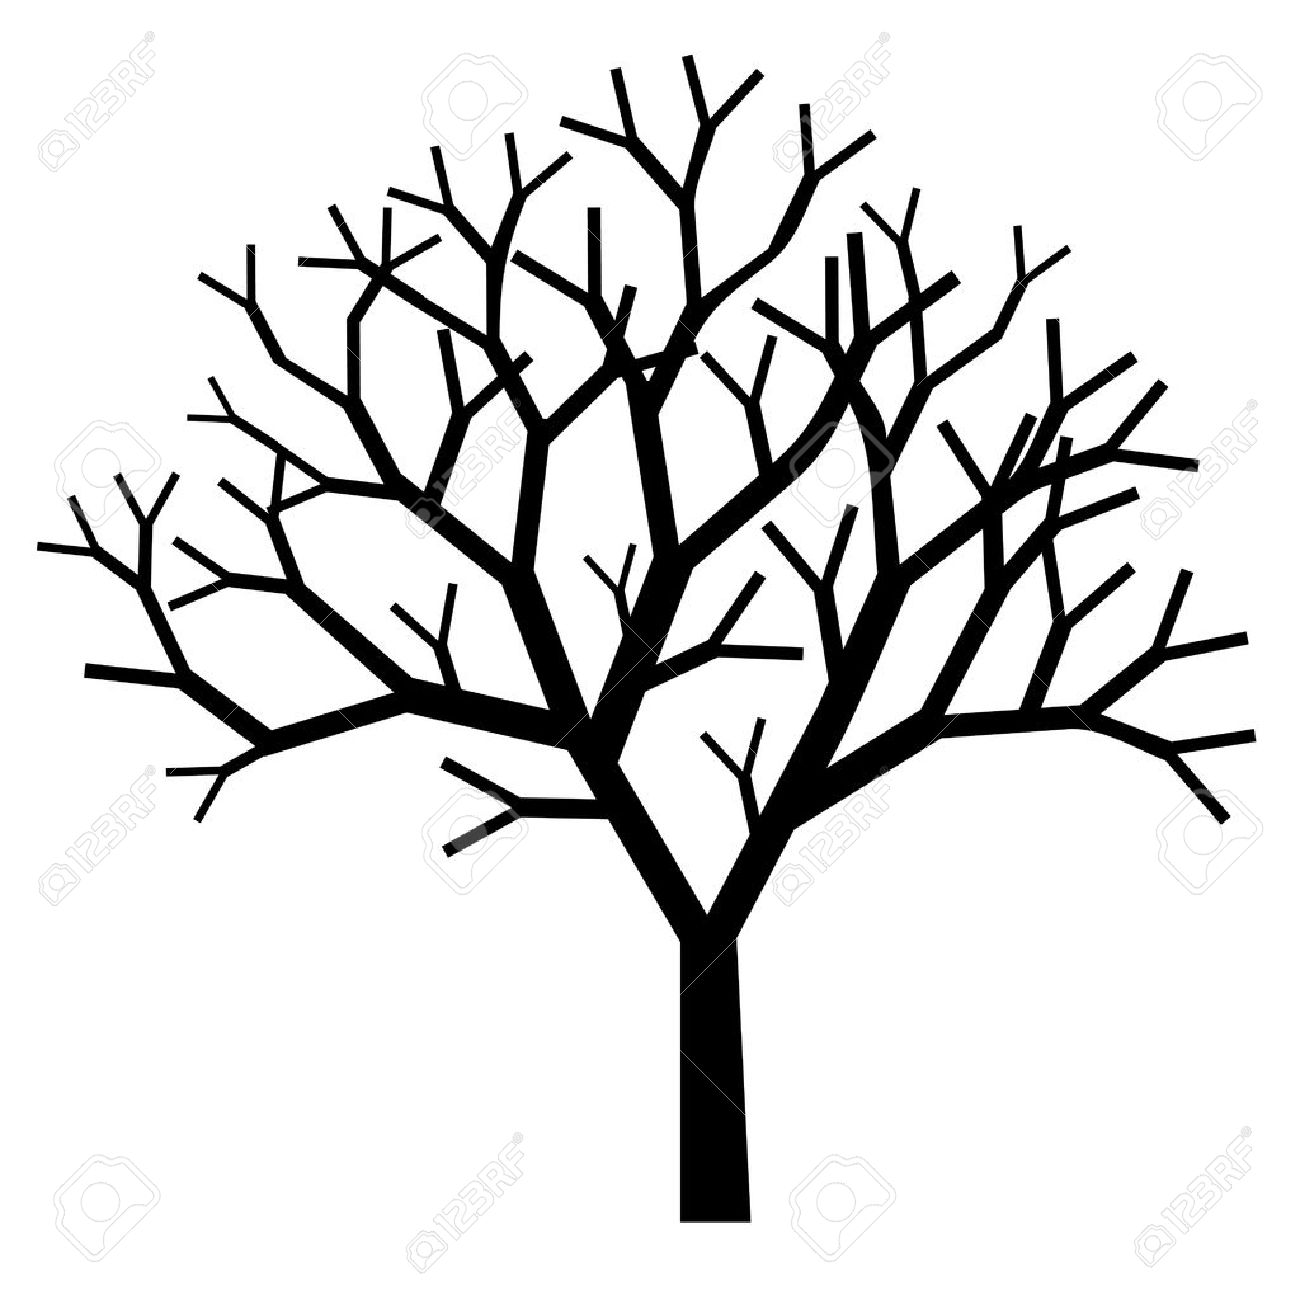 1300x1300 Drawn Dead Tree Silhouette